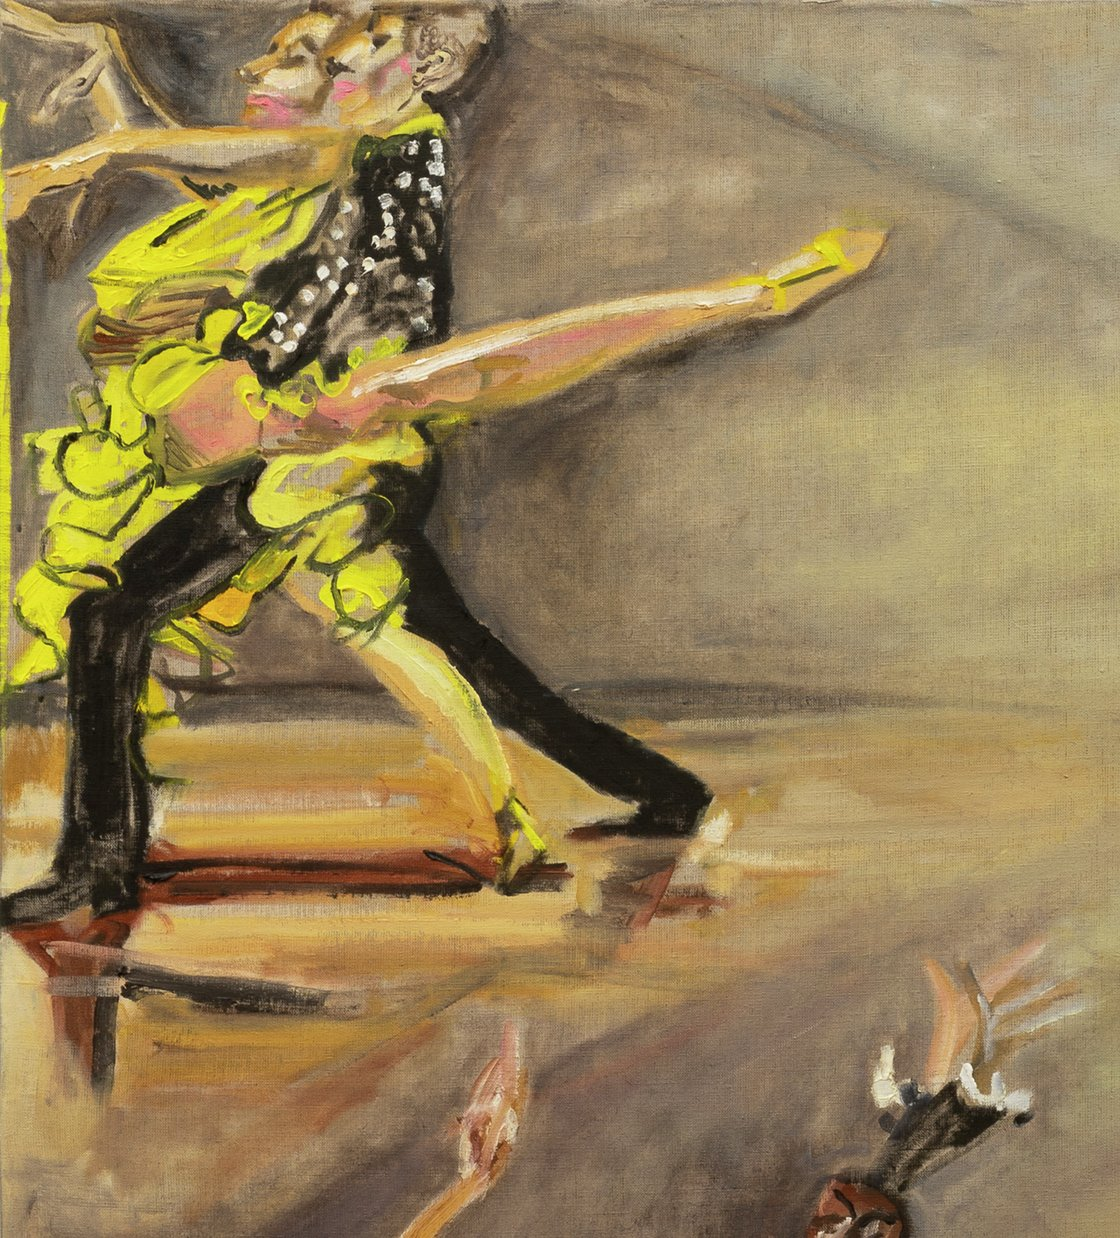 , International Dance, 2020